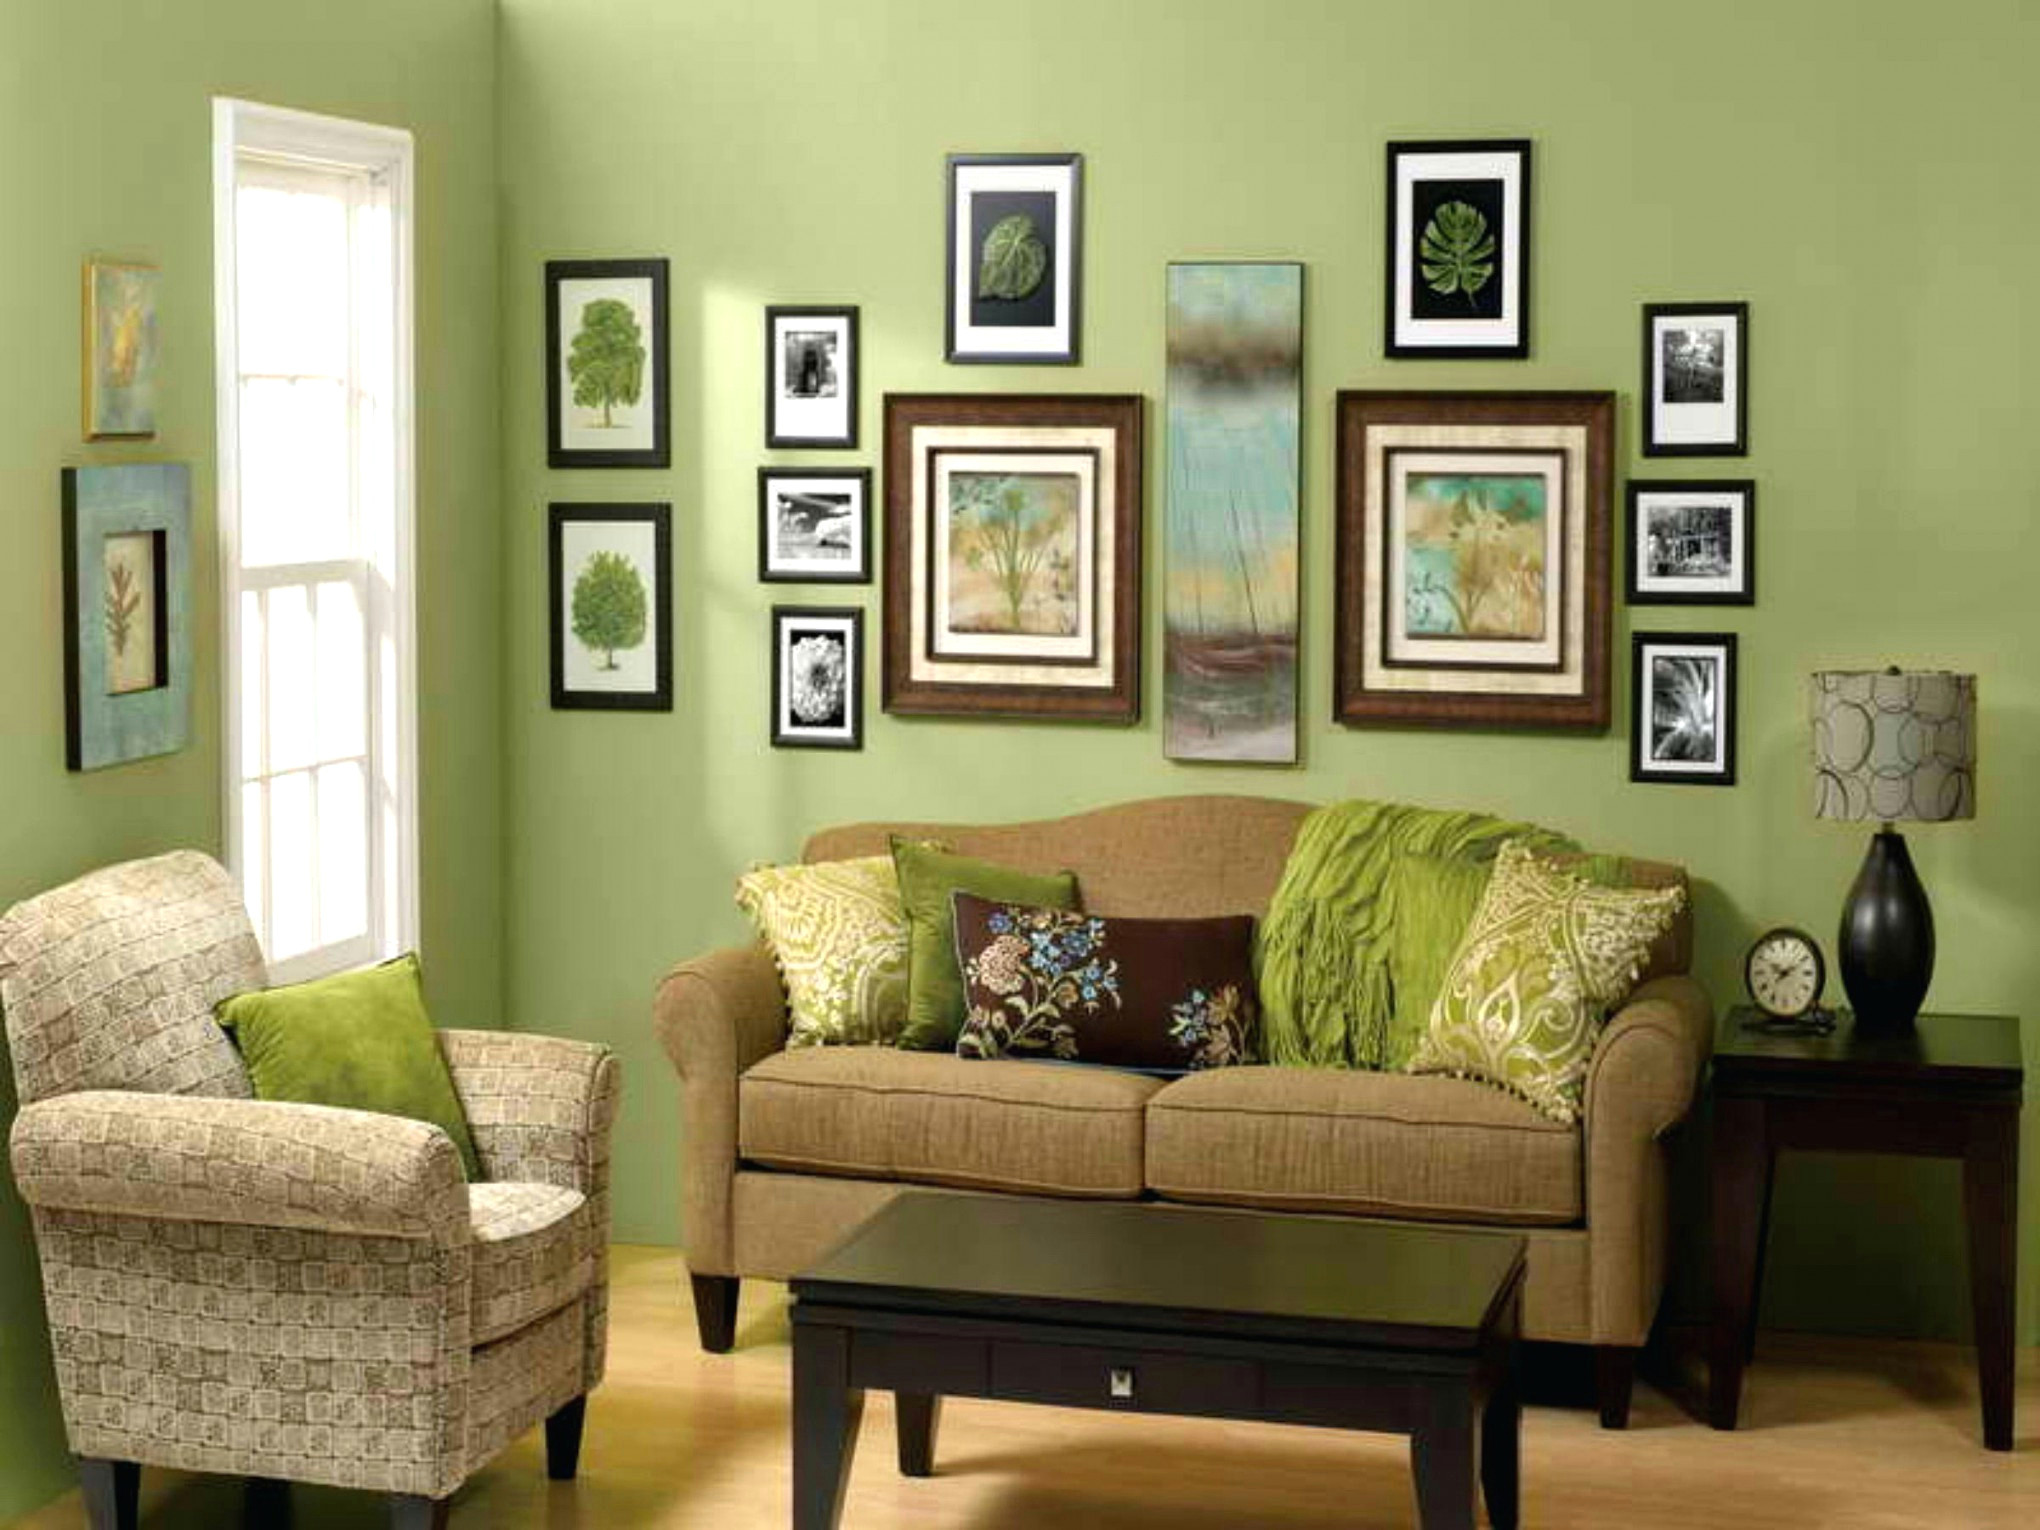 traditional wall decor ideas cute living room traditional decorating ideas awesome shaker chairs 0d